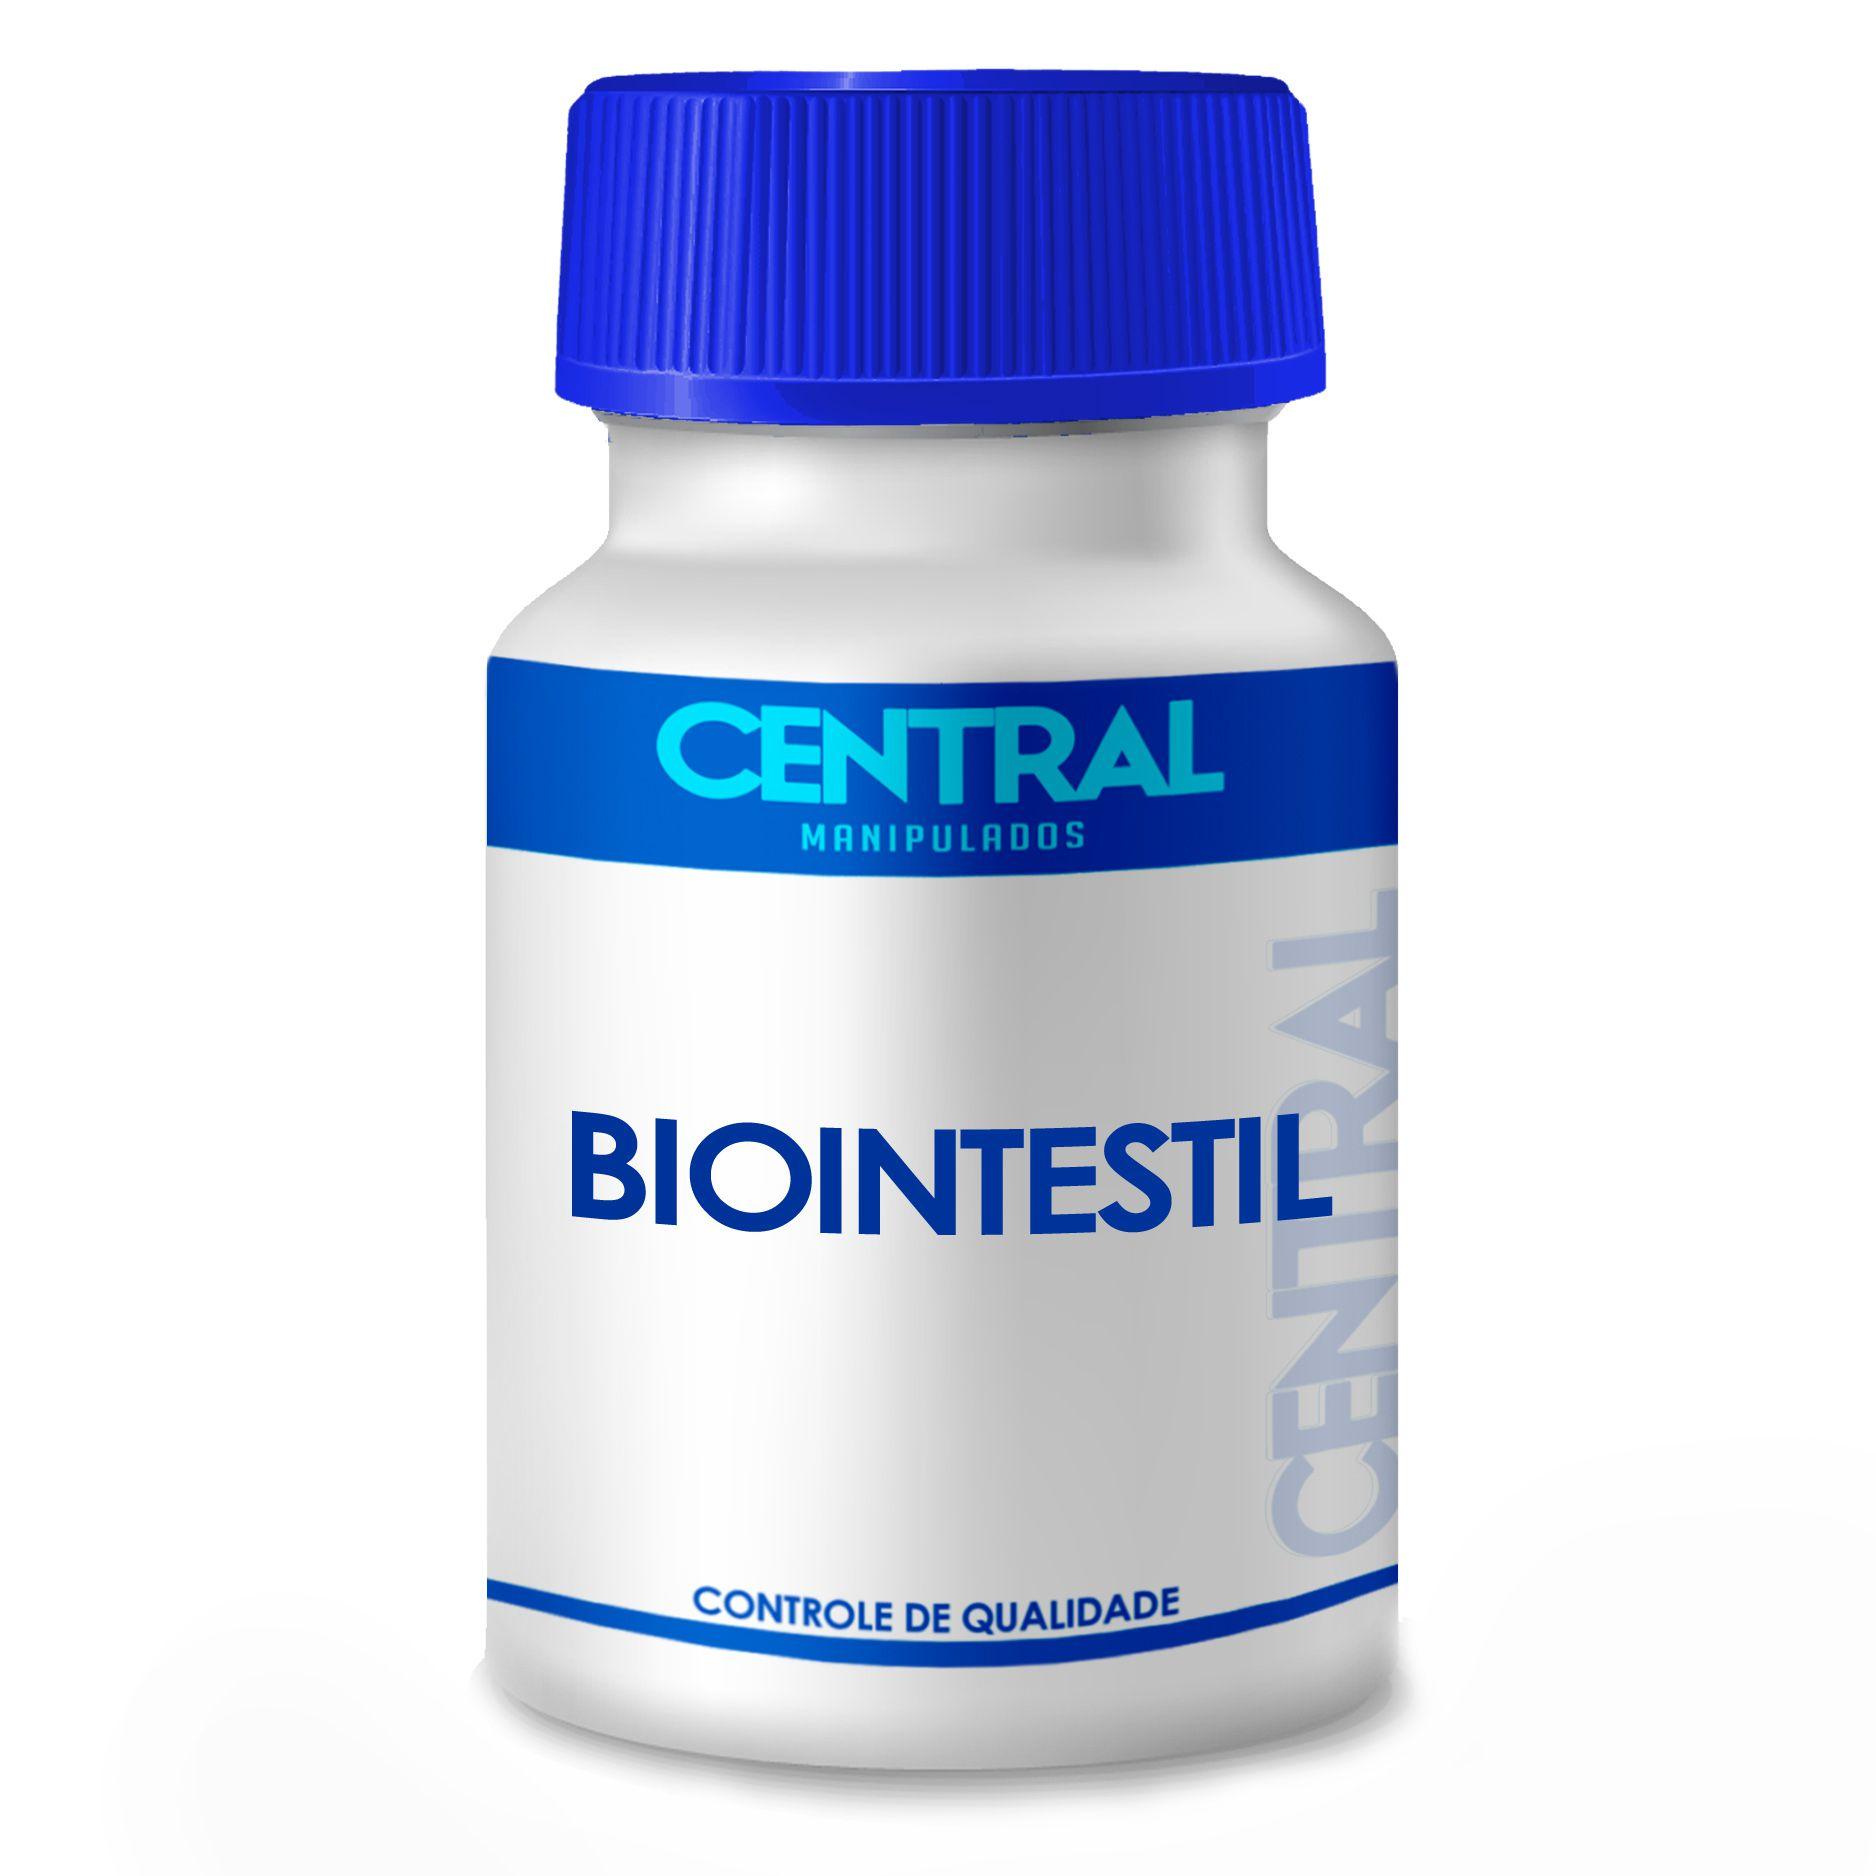 BIOINTESTIL - saúde digestiva - 600MG 60 cápsulas